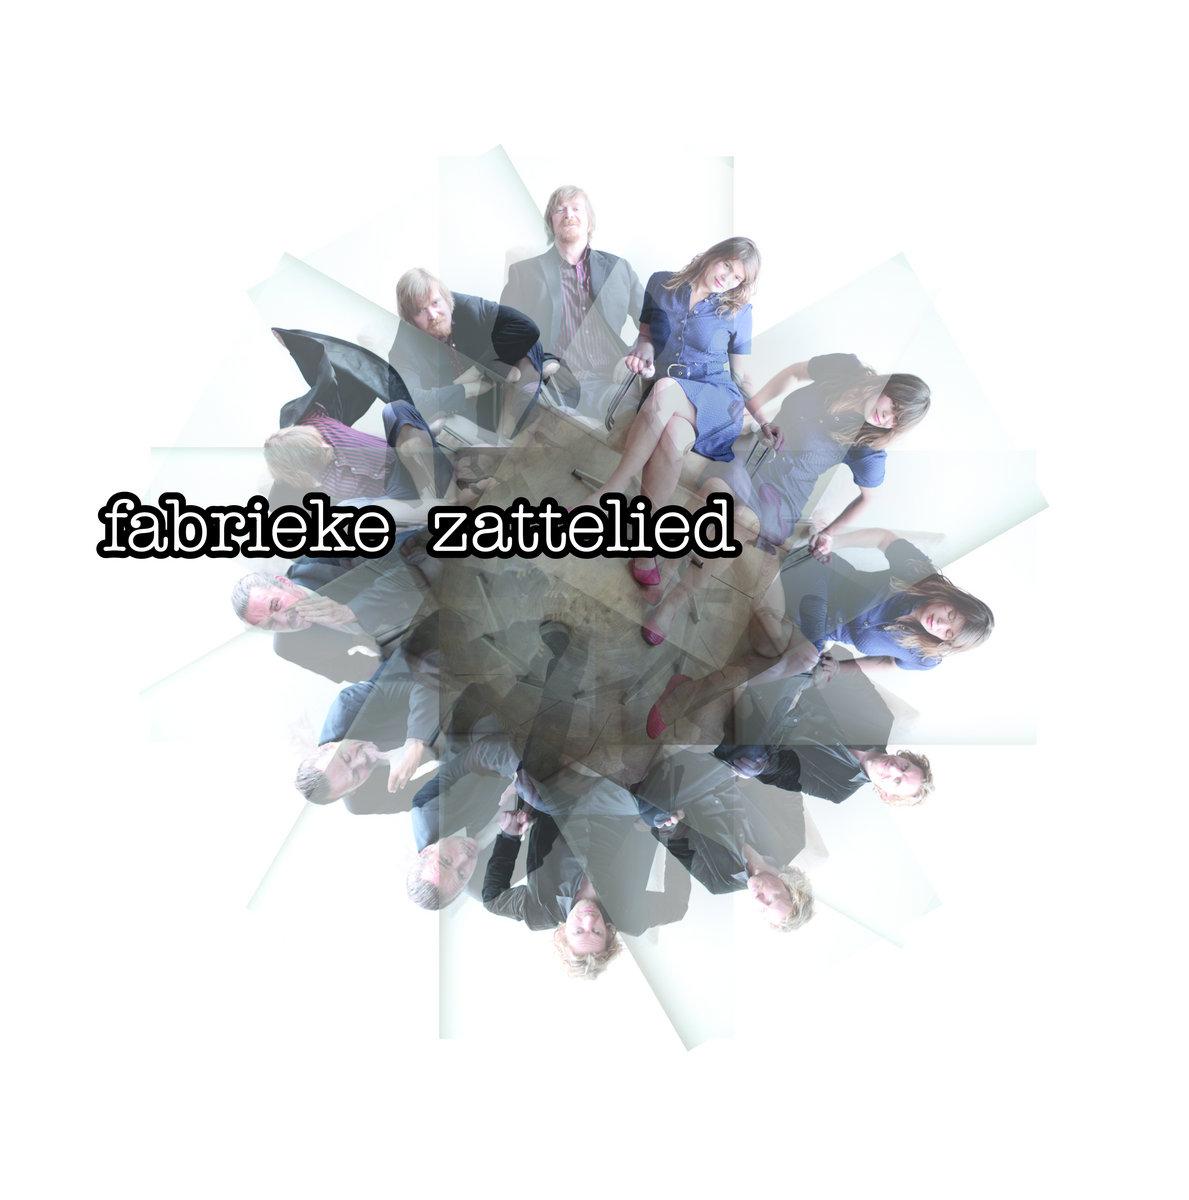 a2734933130_10.jpg